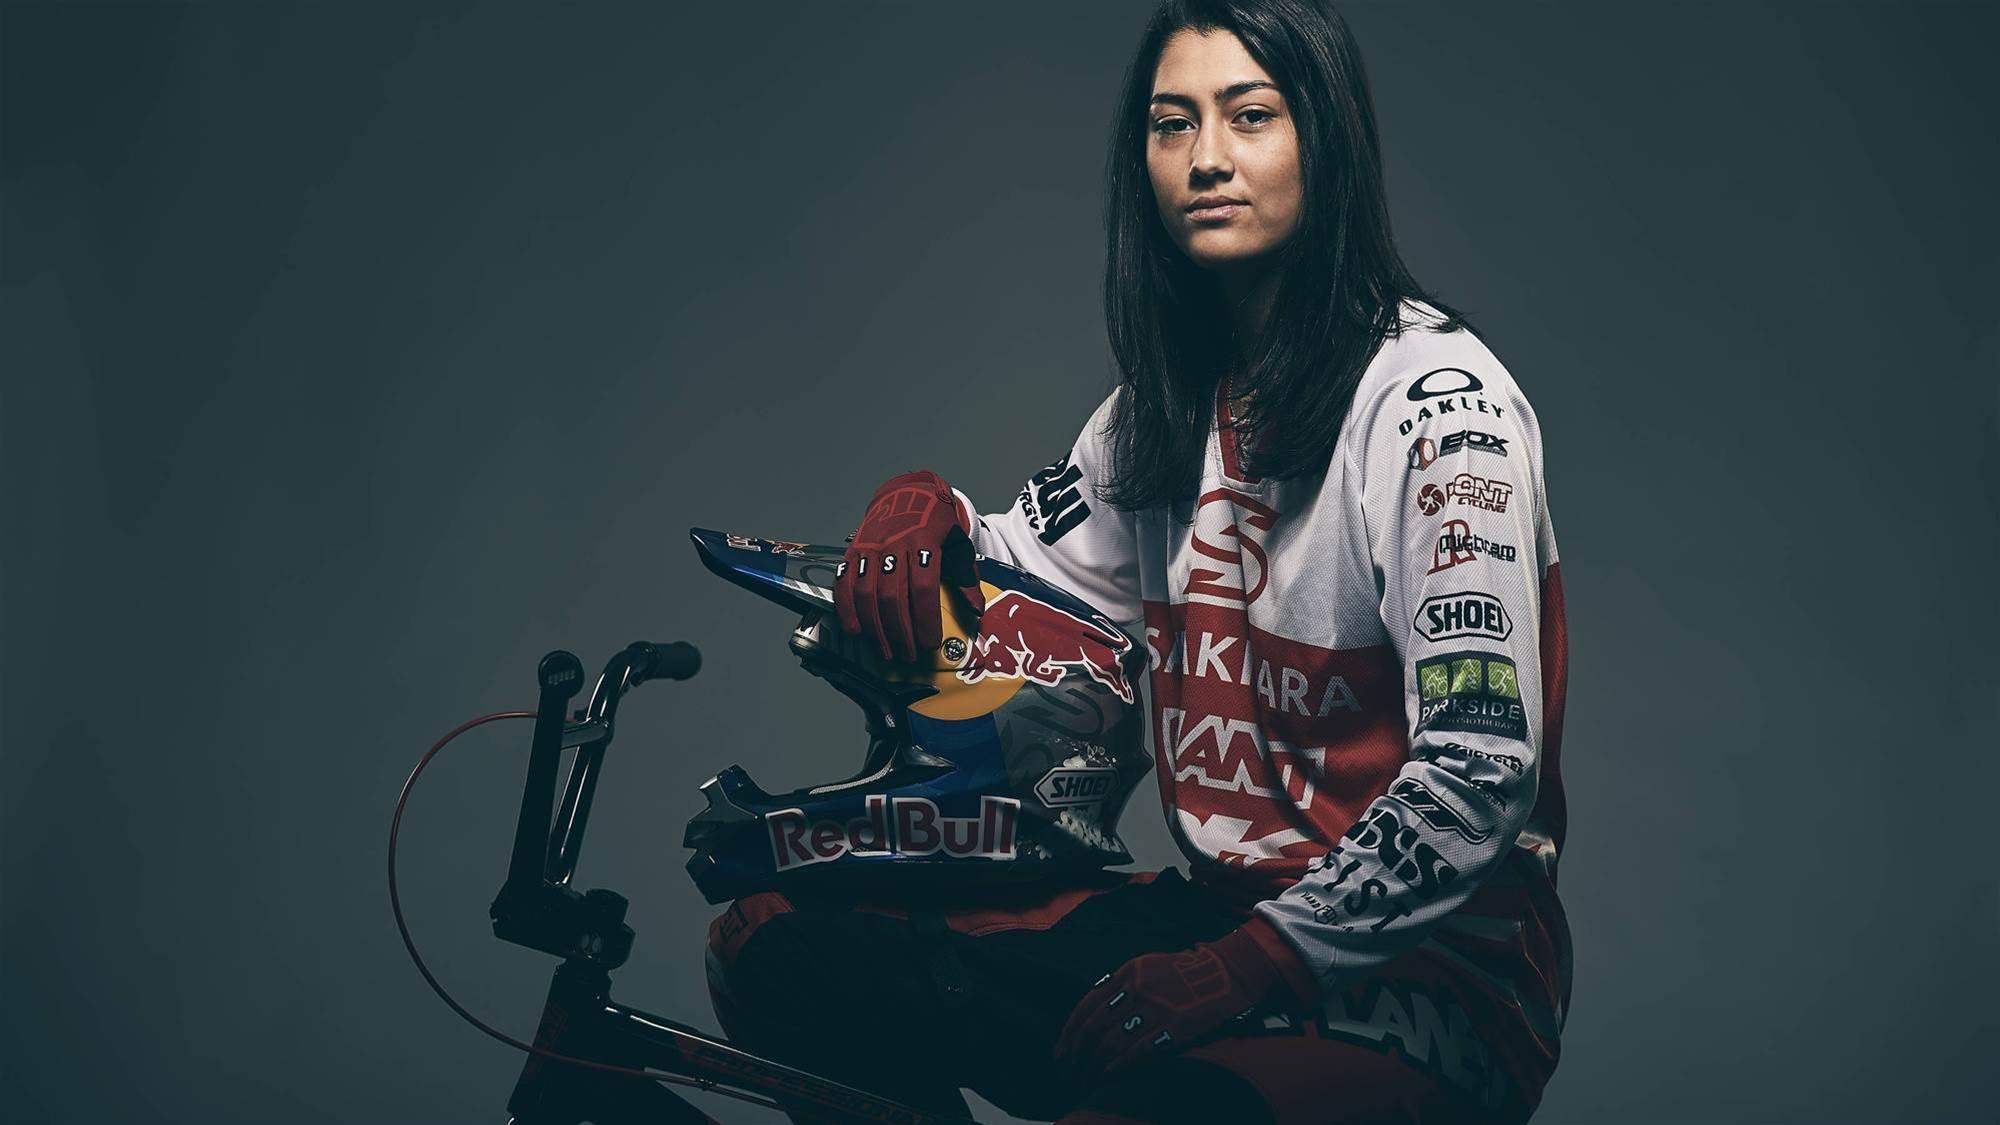 Sakakibara finishes on podium in World Series